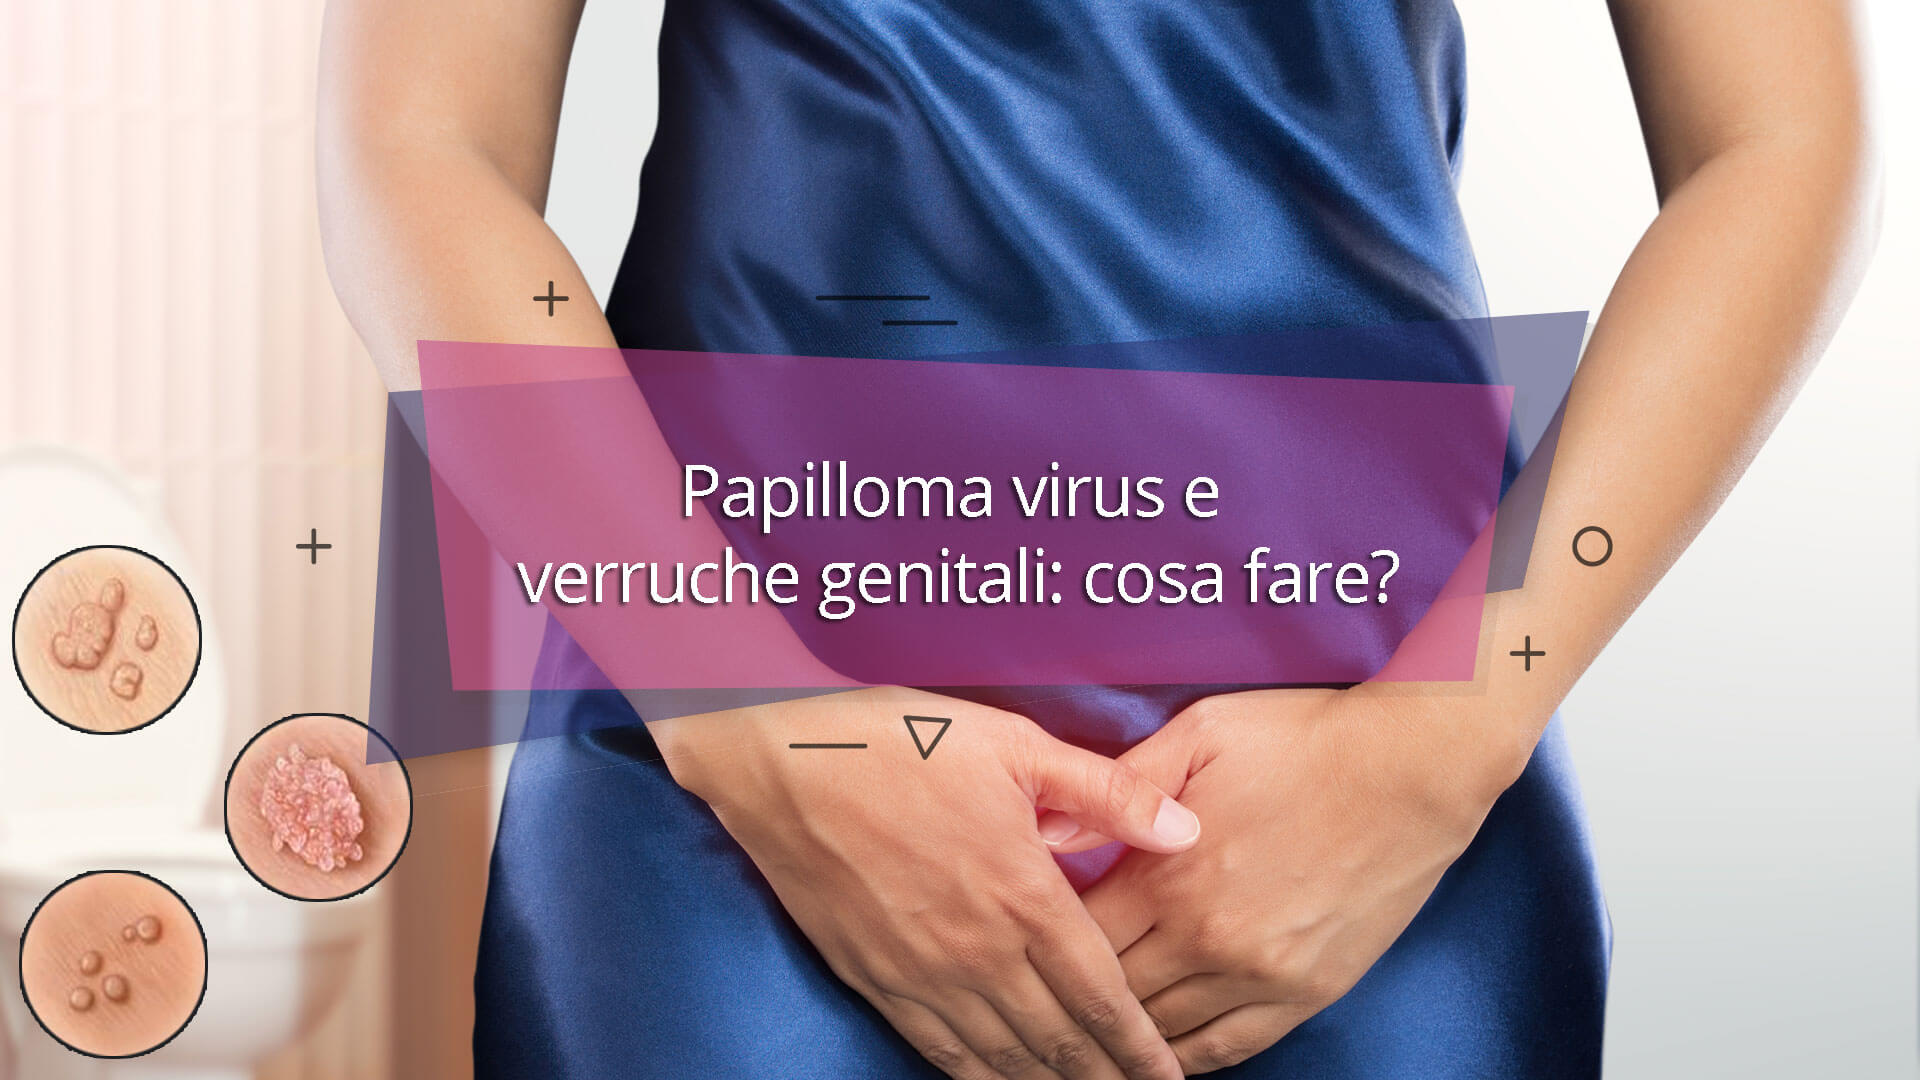 papilloma virus da bruciore detoxicolon capsule pareri